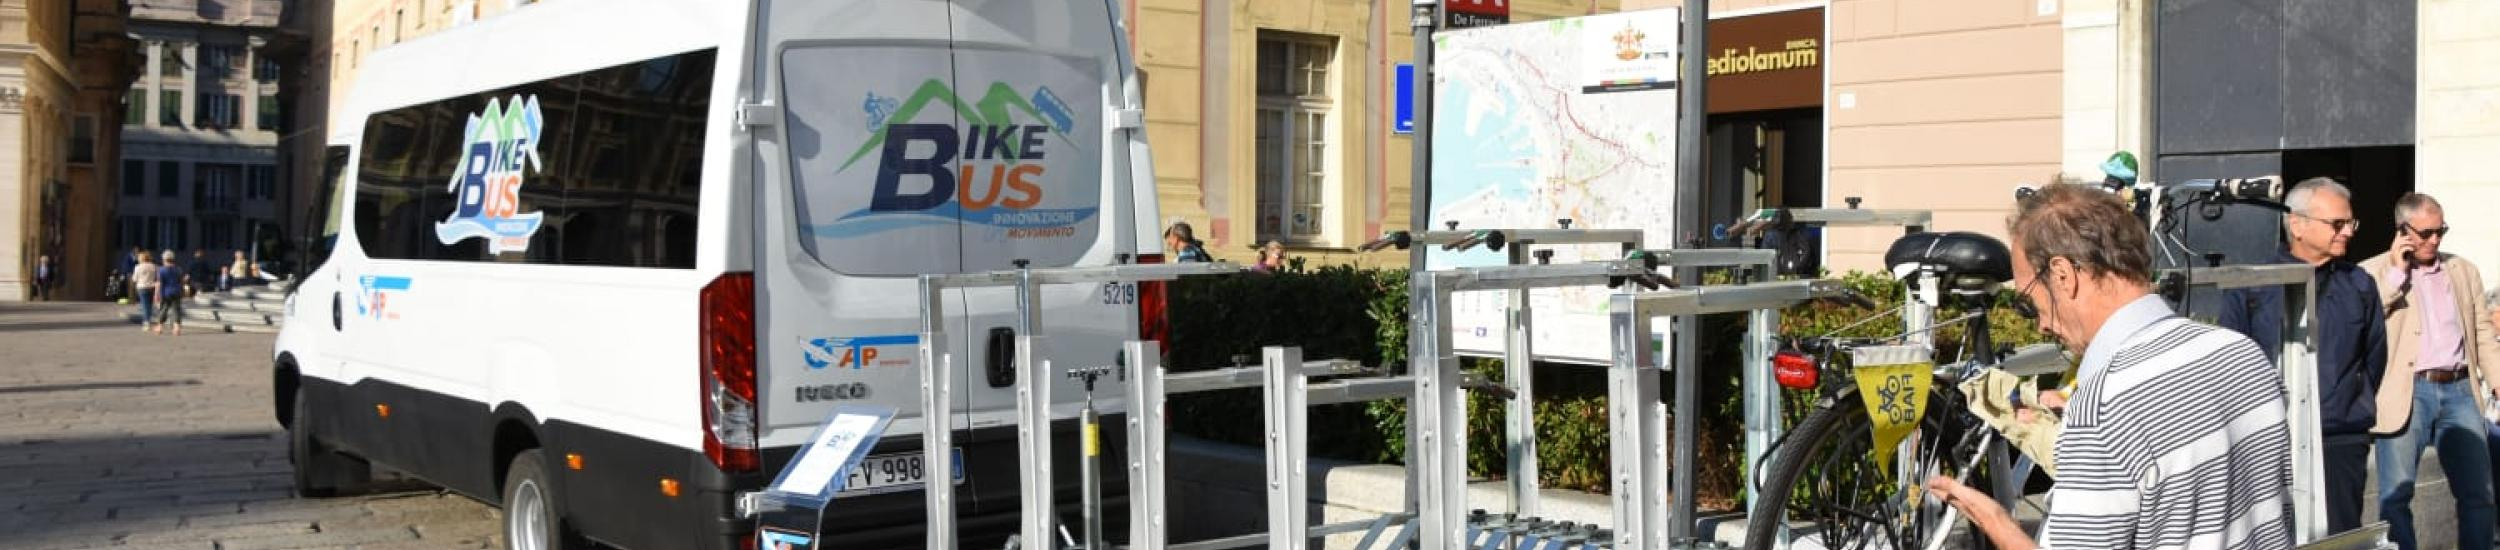 Il bike bus in piazza De Ferrari